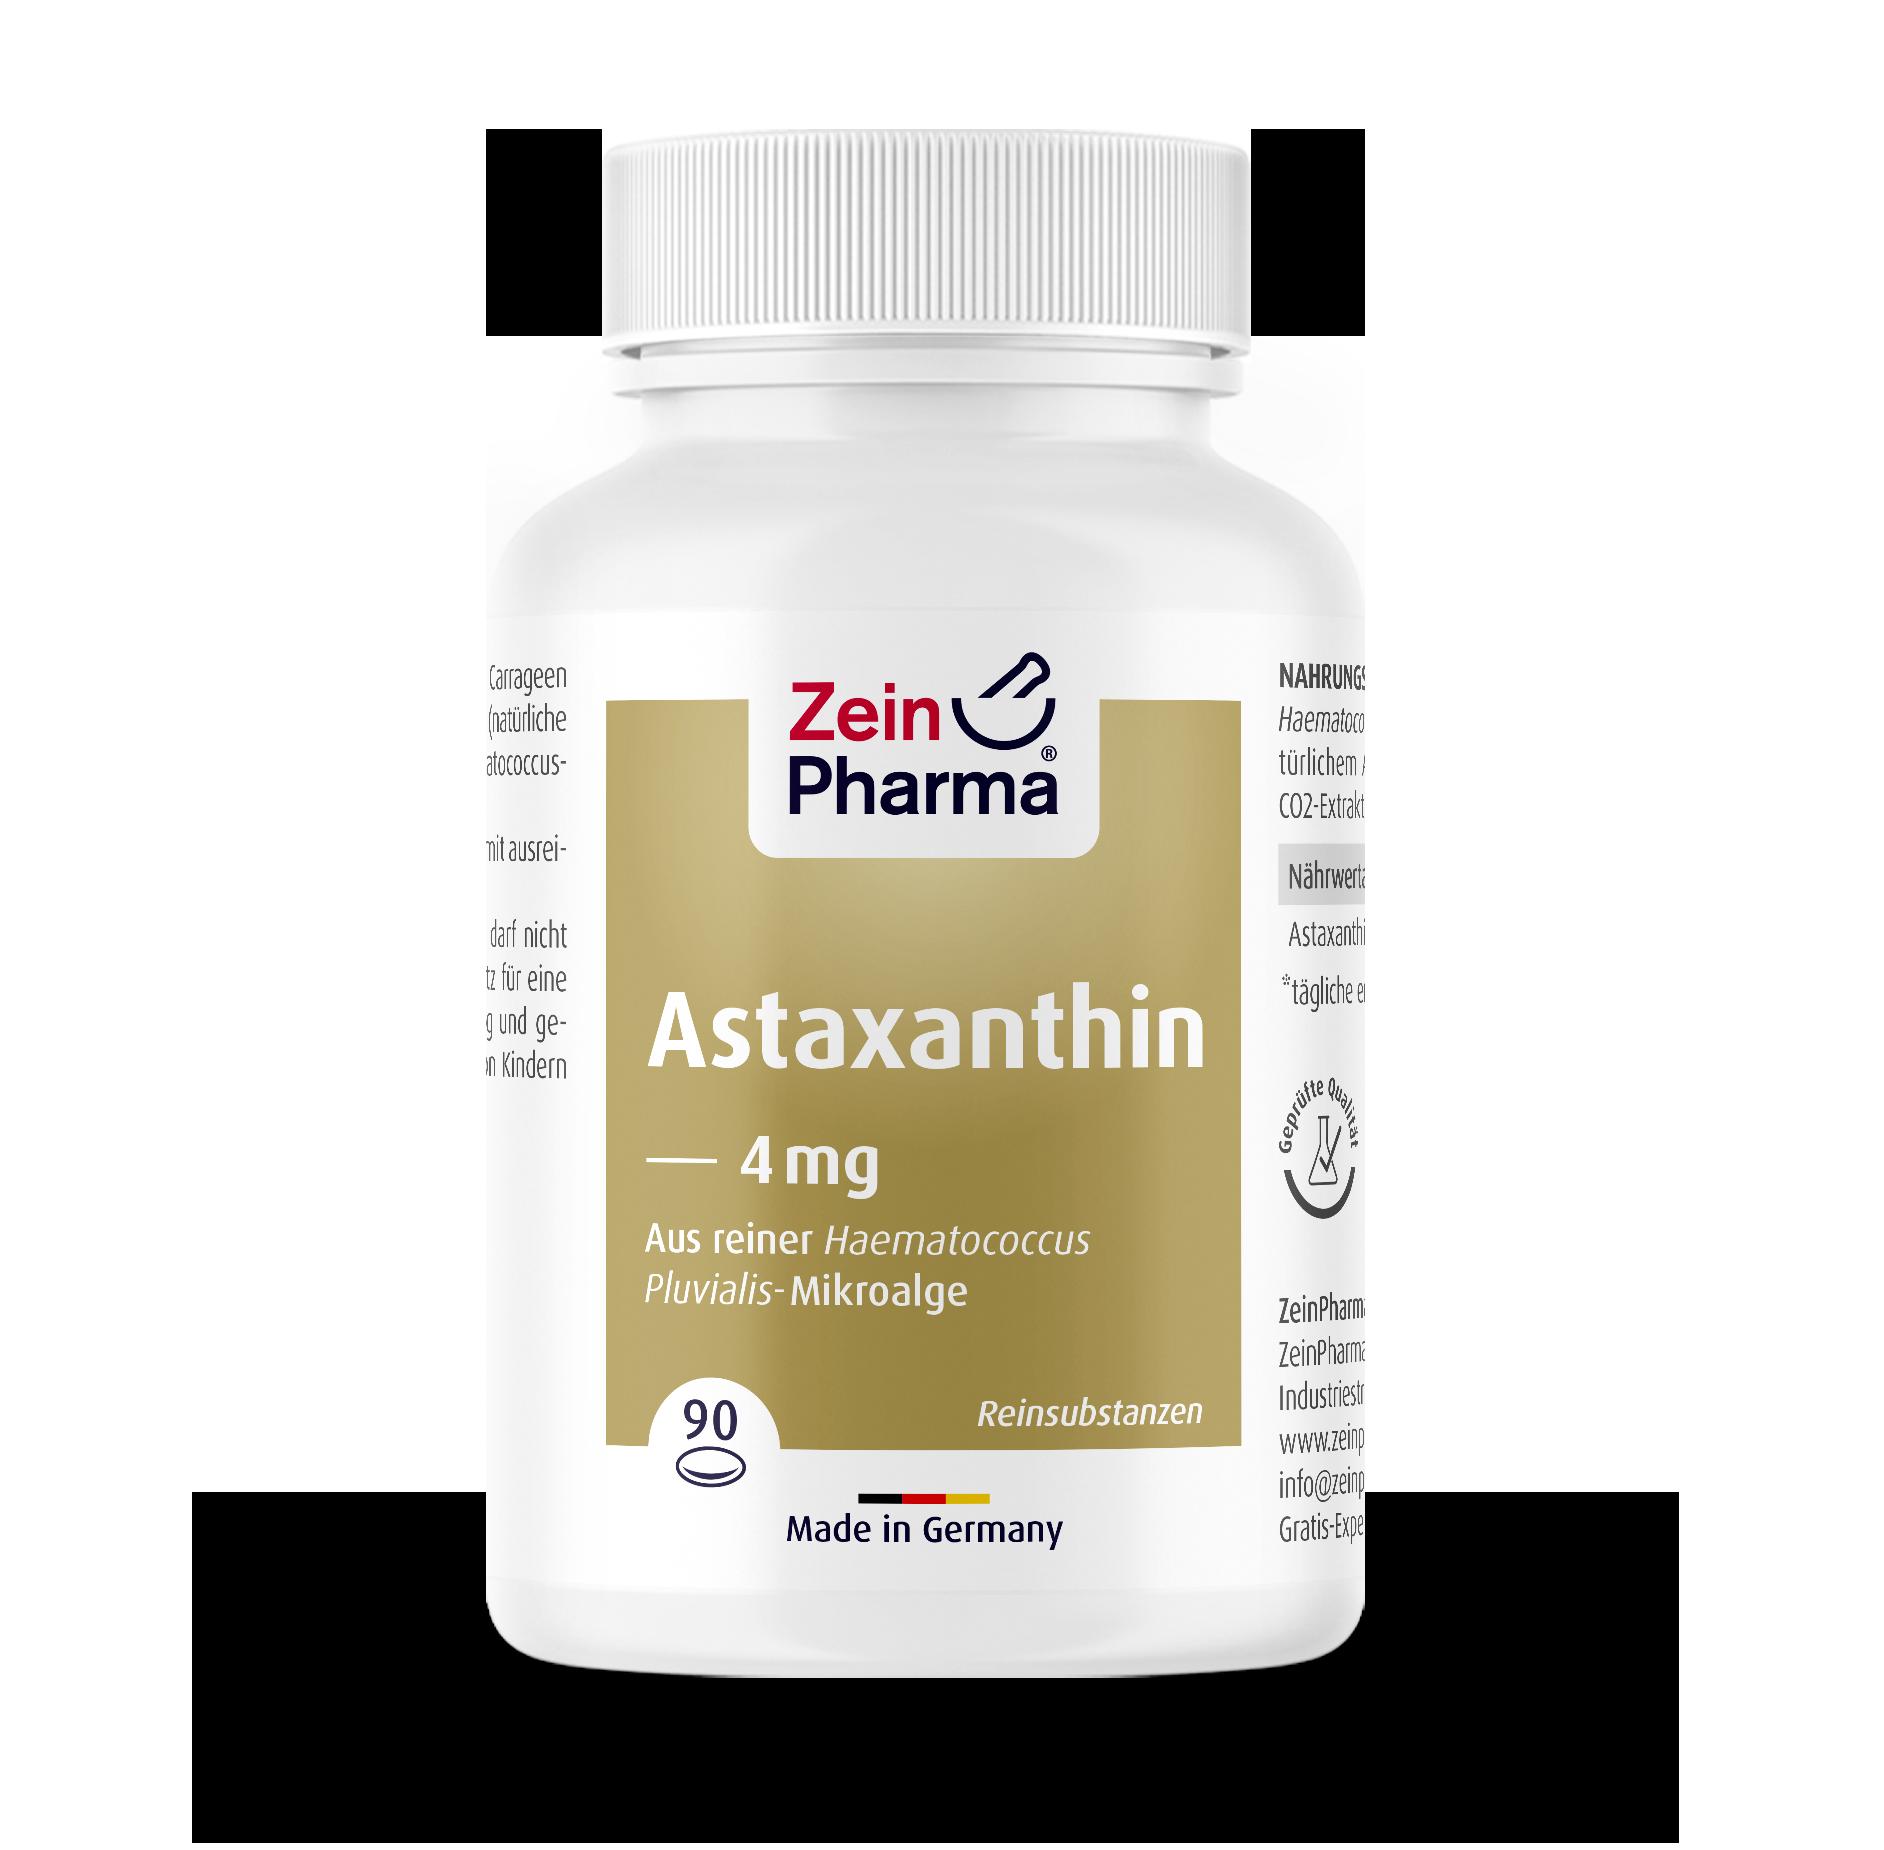 Astaxanthin 4 mg Softgel Capsules